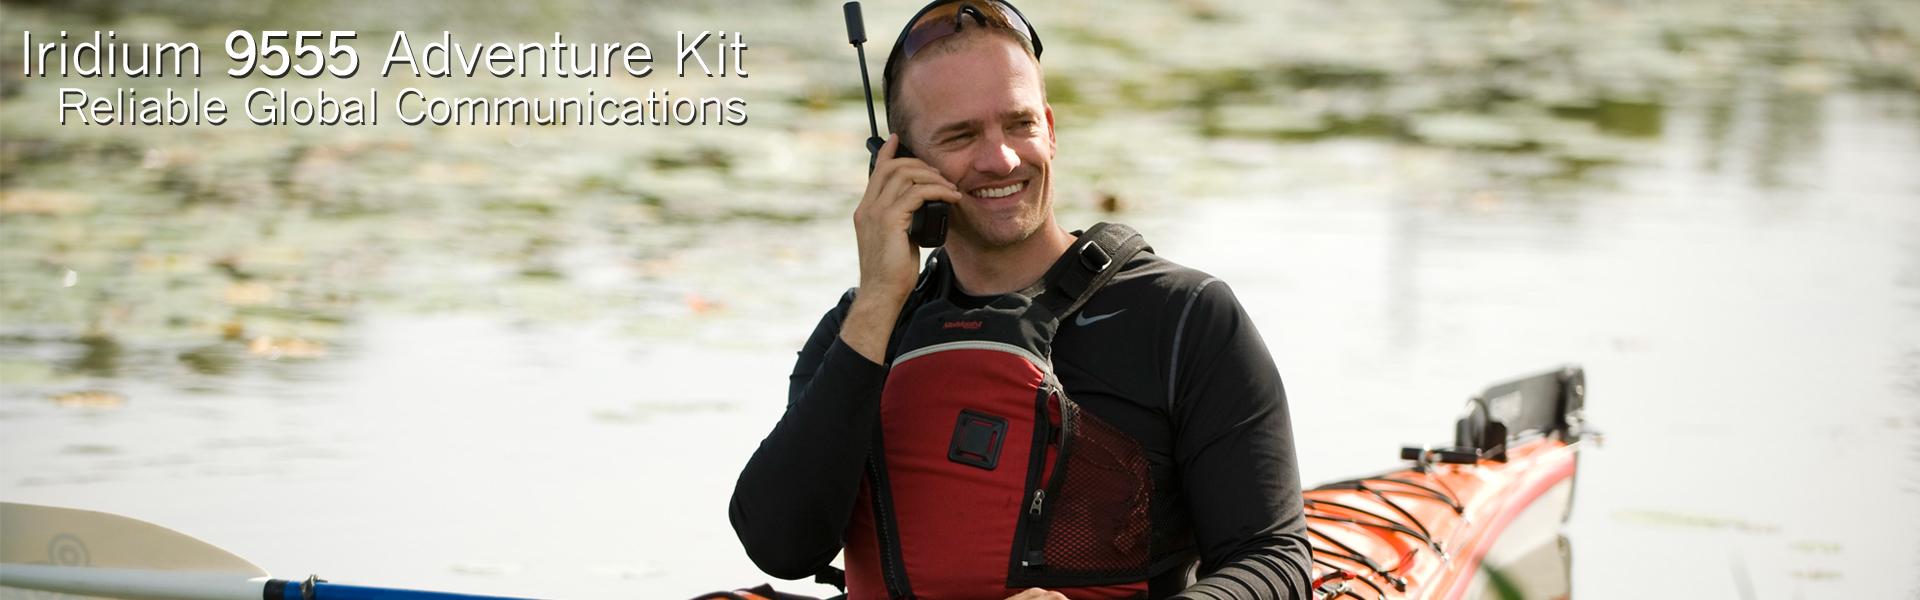 iridium-9555-adventure-kit-for-all-travelers-northernaxcess.jpg